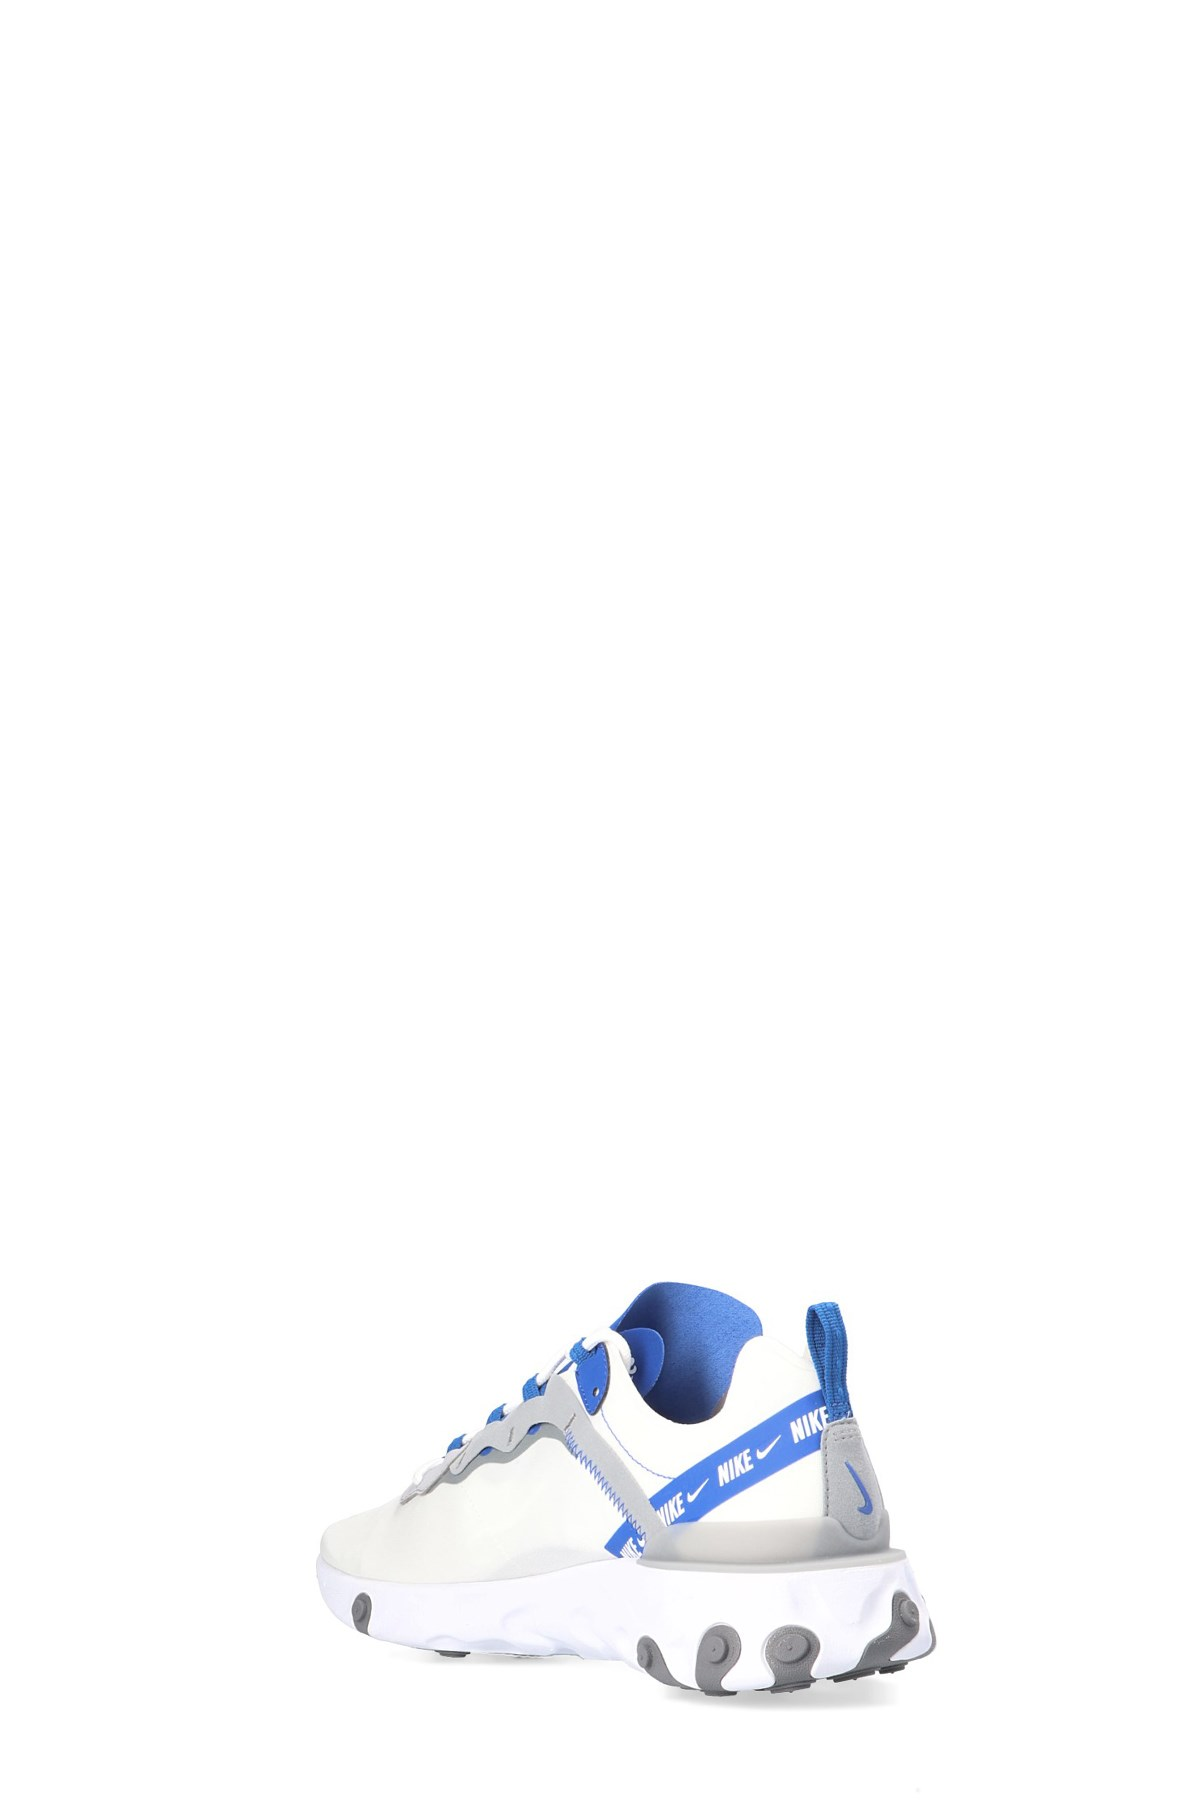 low priced c1aac 12bee NIKE React element 55 sneakers - COD. CD7340100